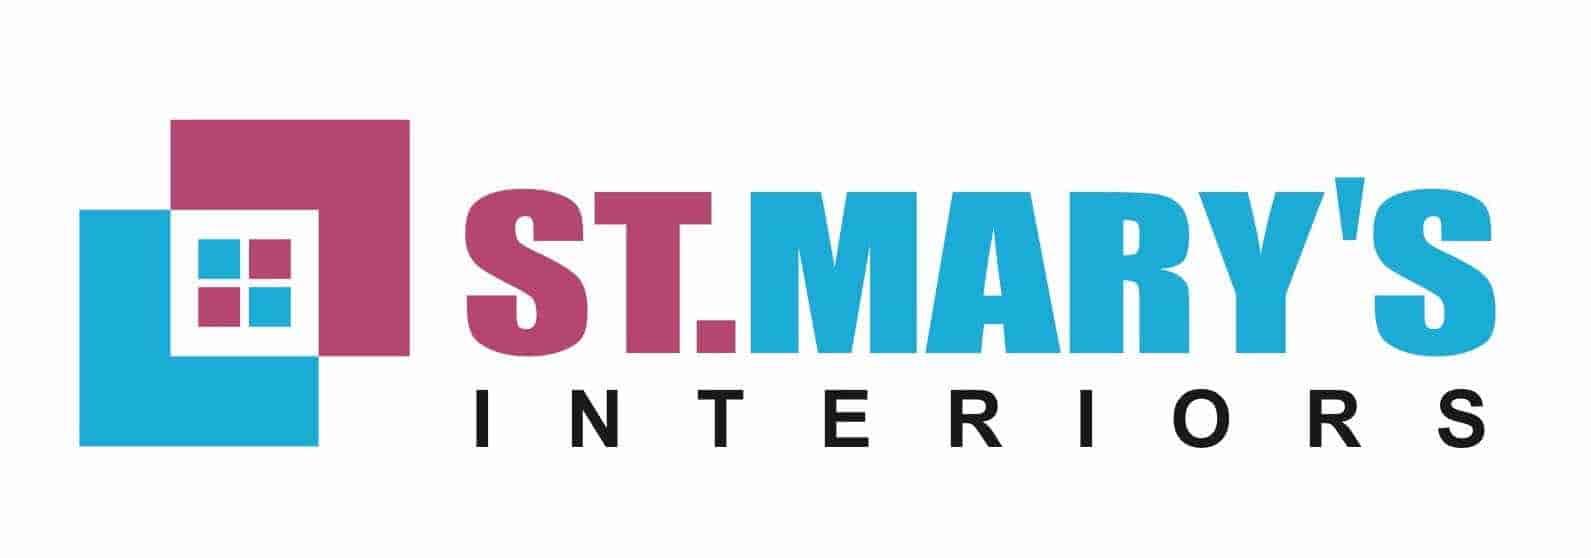 Stmarys Interiors Photos, Nattassery S H Mount, Kottayam- Pictures ...